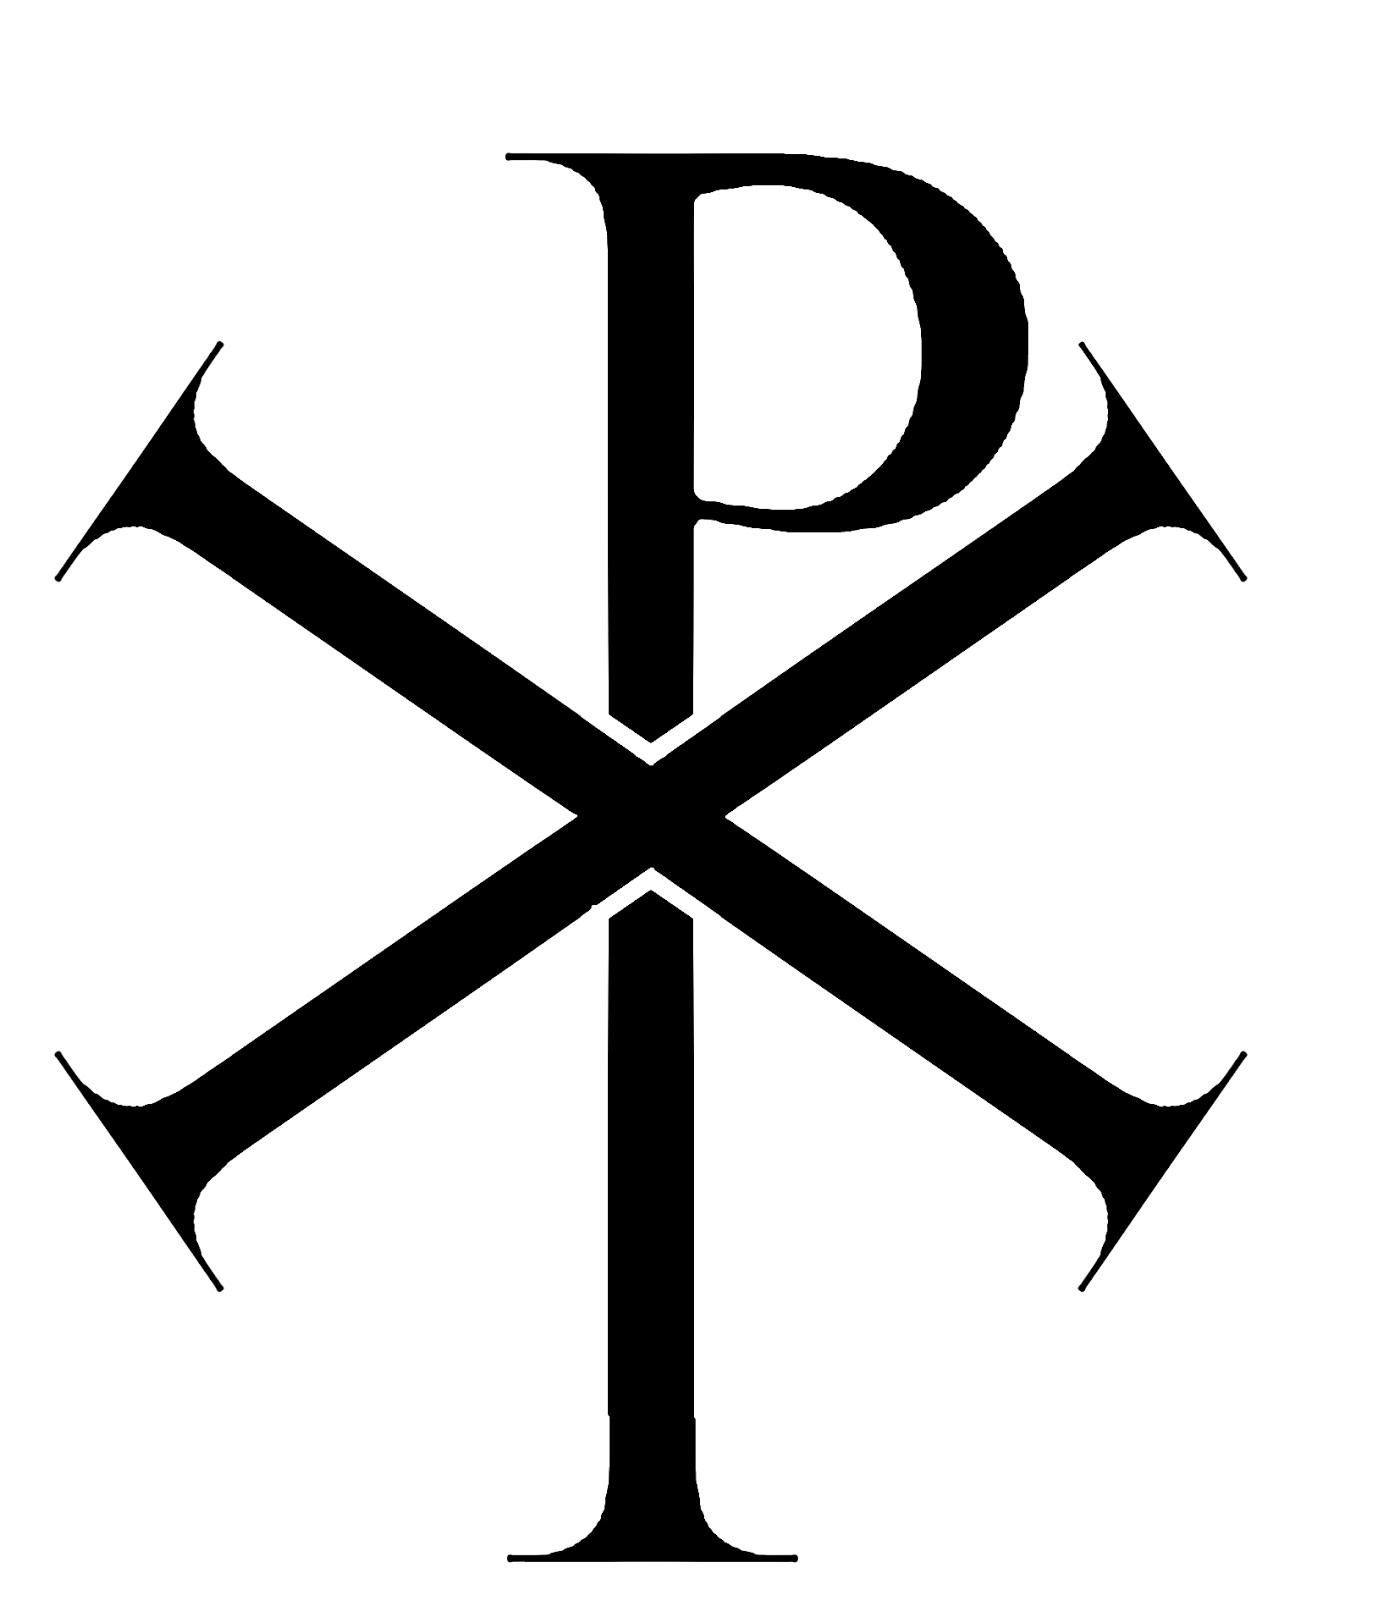 Symbols of ruthenia simcountry fandom powered by wikia labarum biocorpaavc Gallery